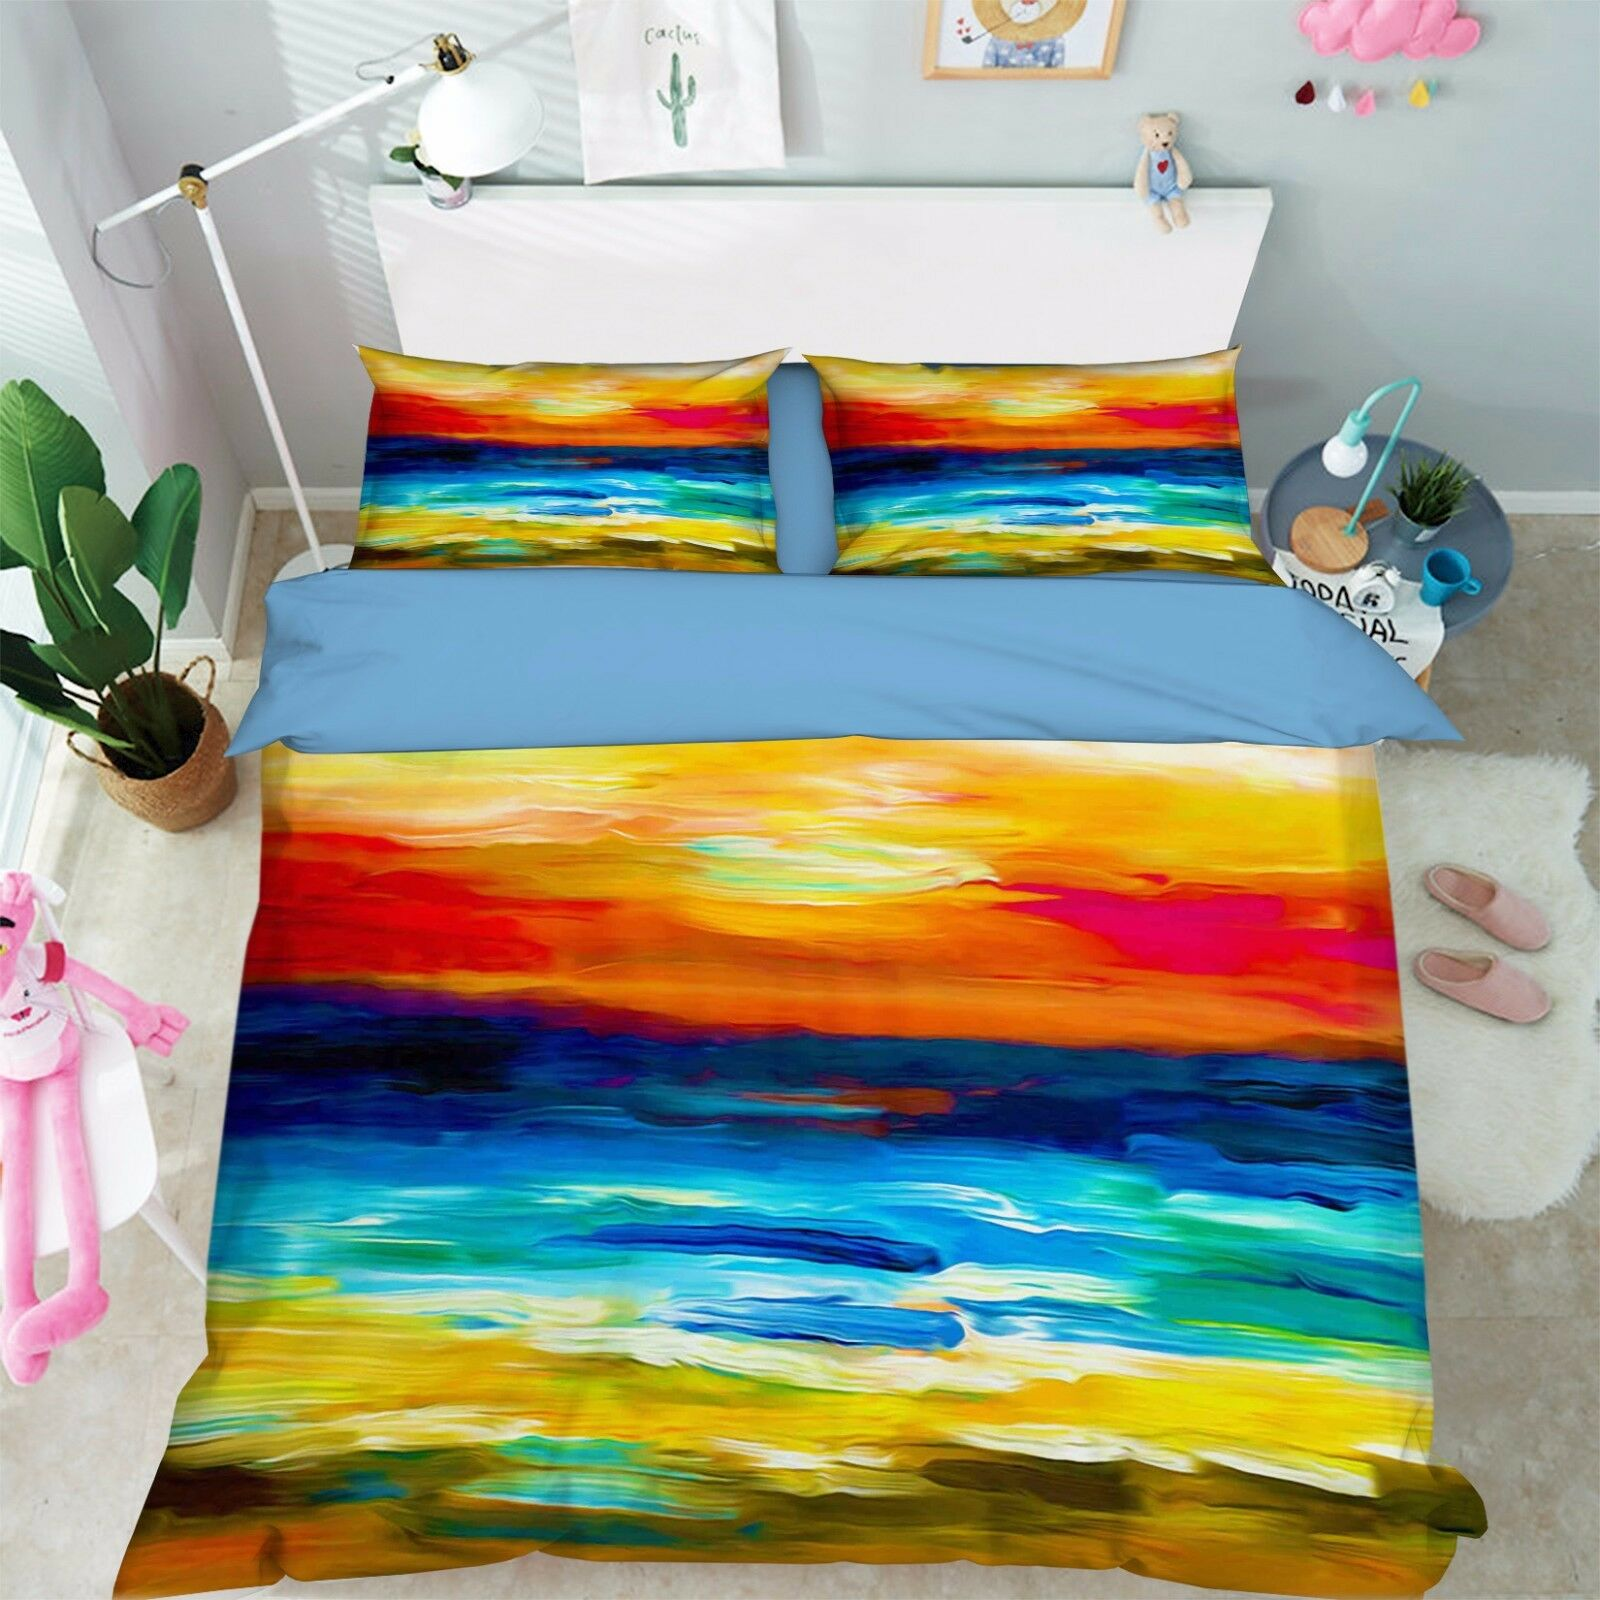 3D Sunset Sky 806 Bed Pillowcases Quilt Duvet Cover Set Single Queen UK Summer